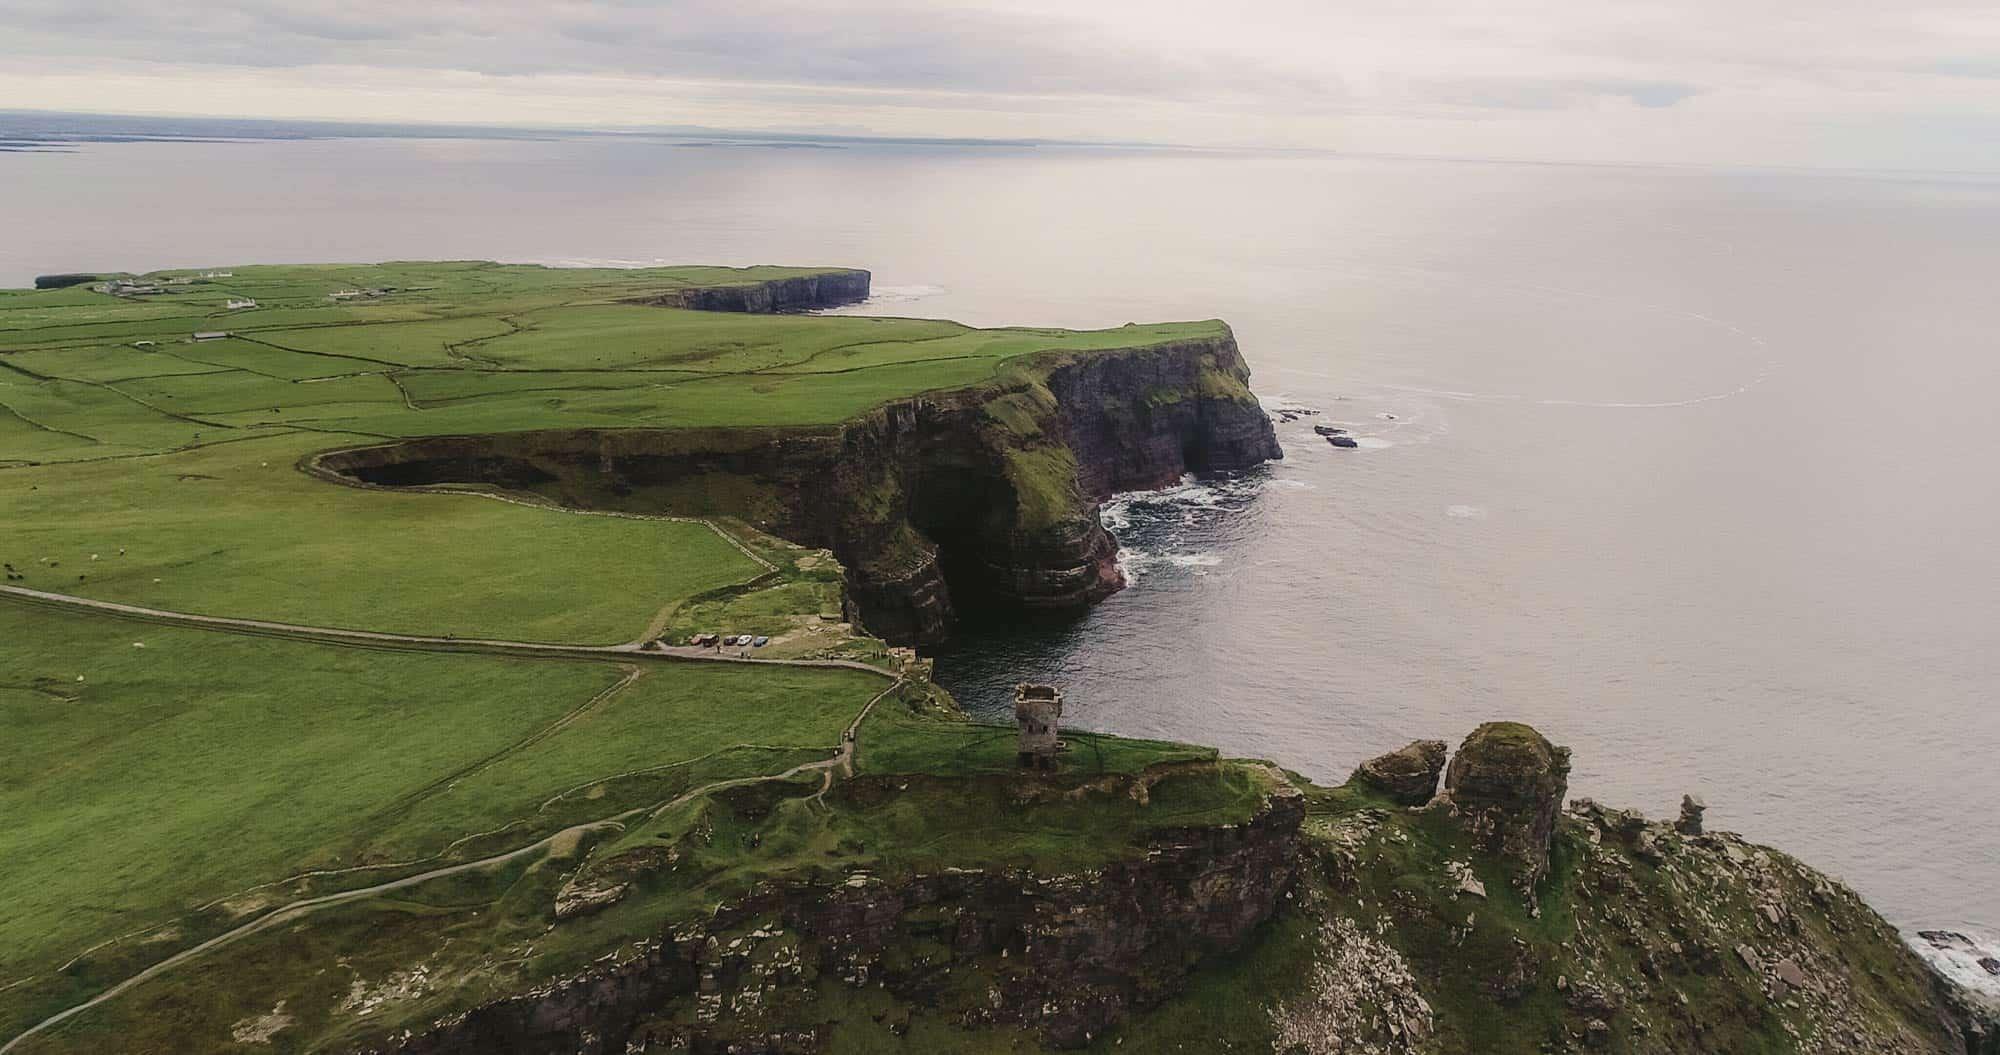 Cliffs of Moher Elopement Drone Shot Hags Head